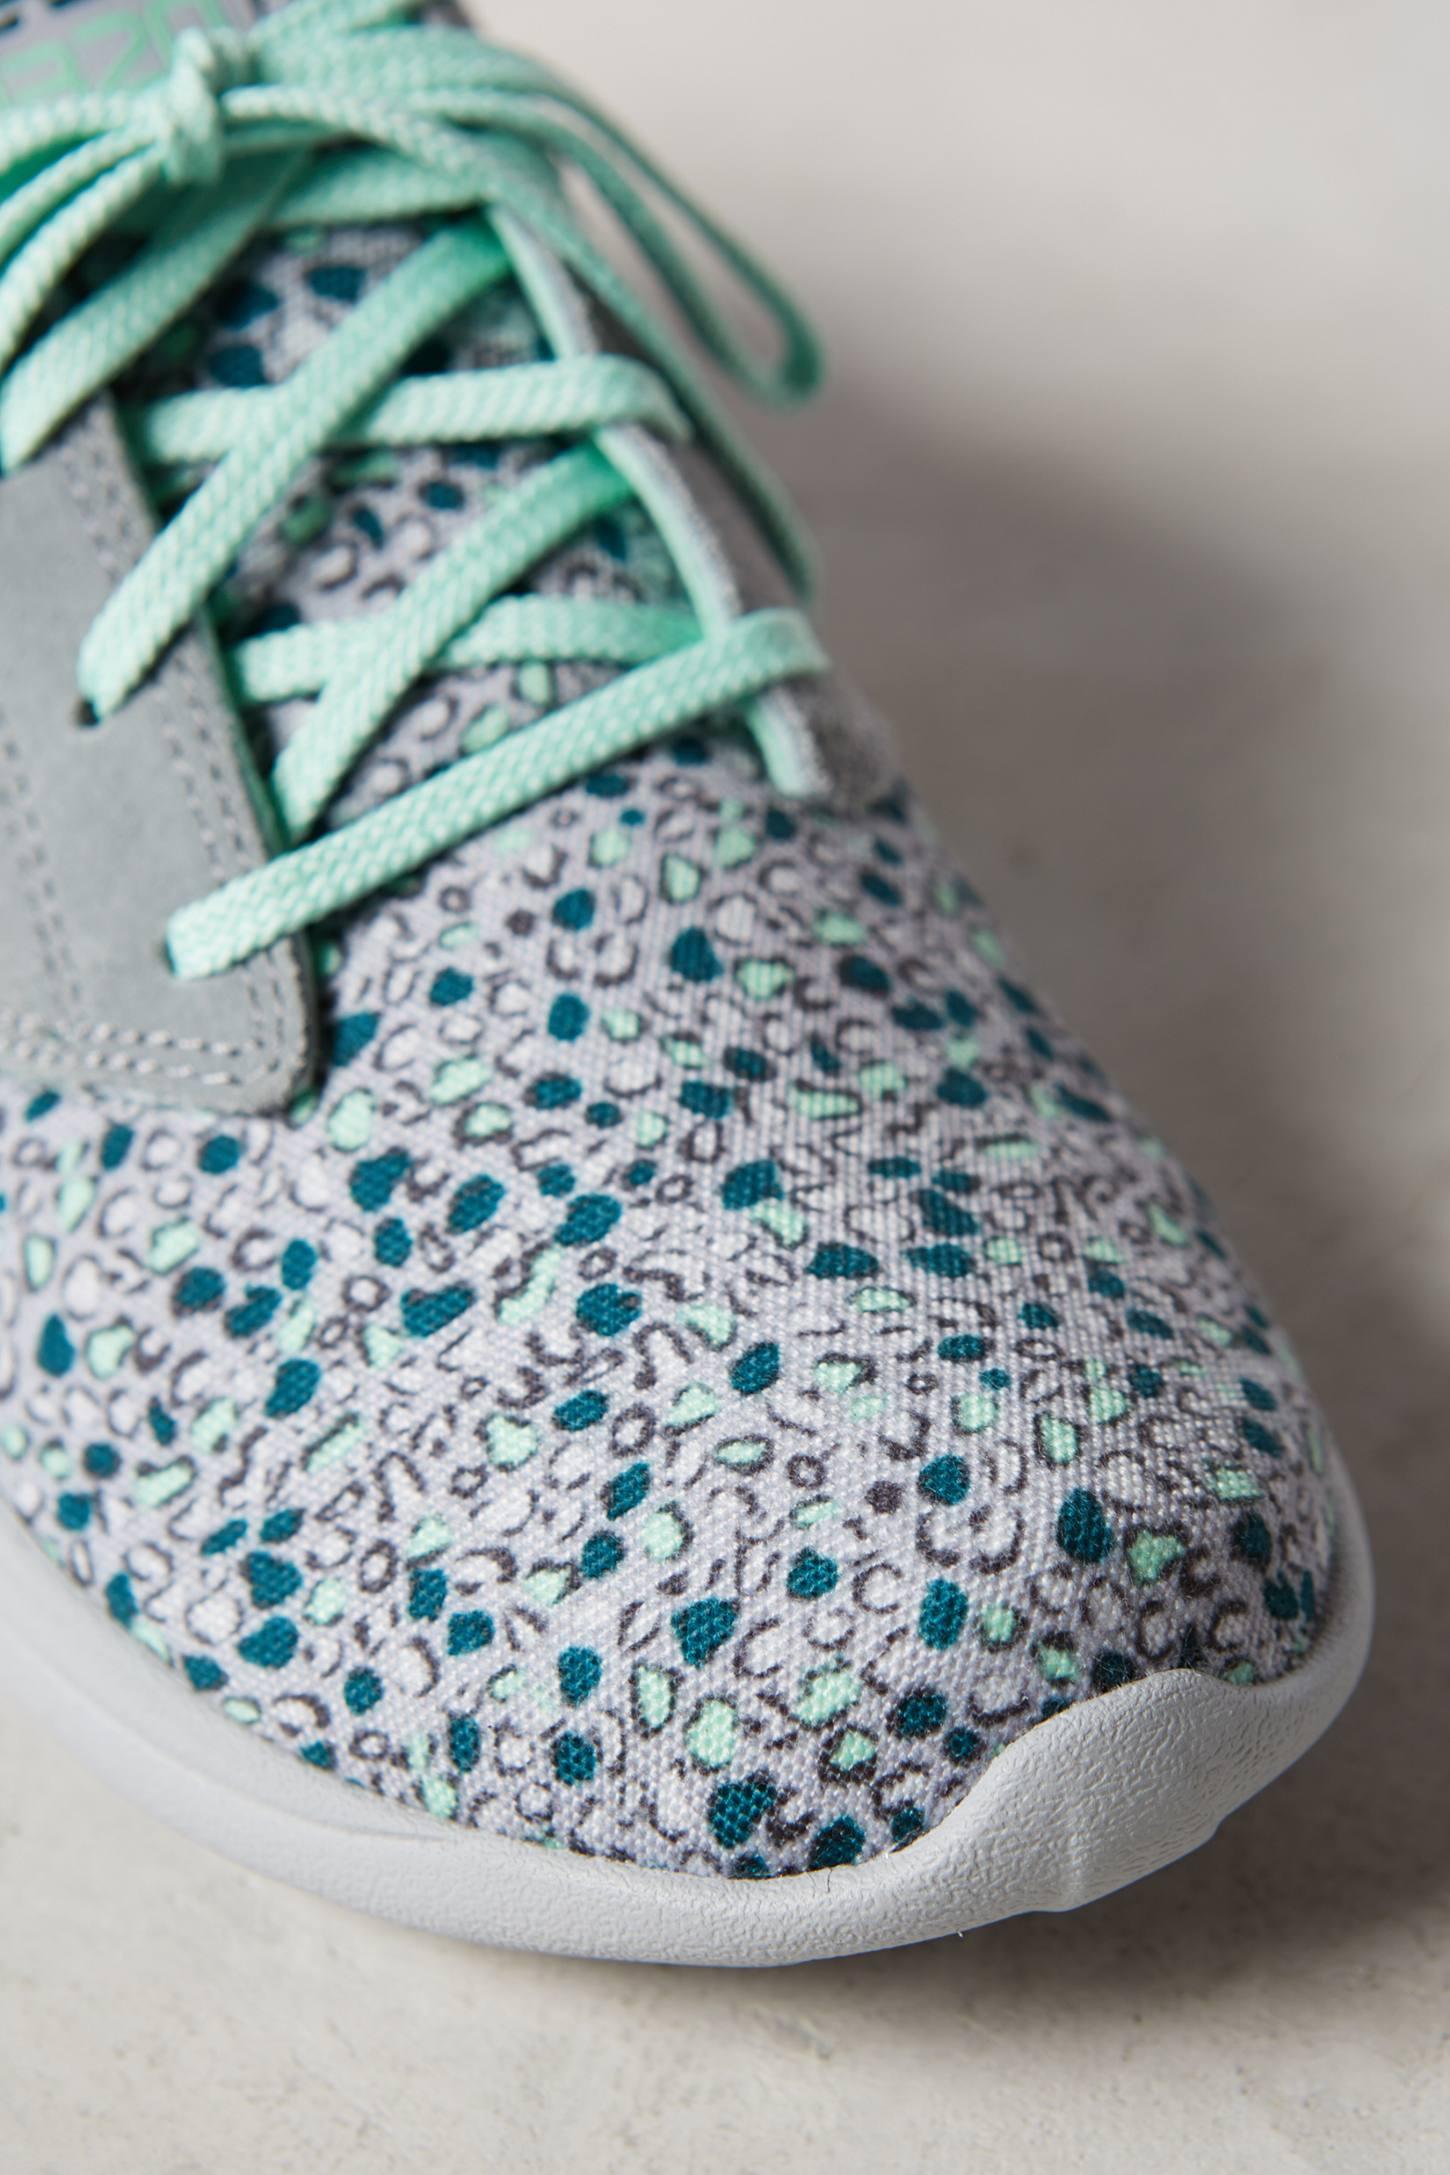 chaussures new balance wl 1320